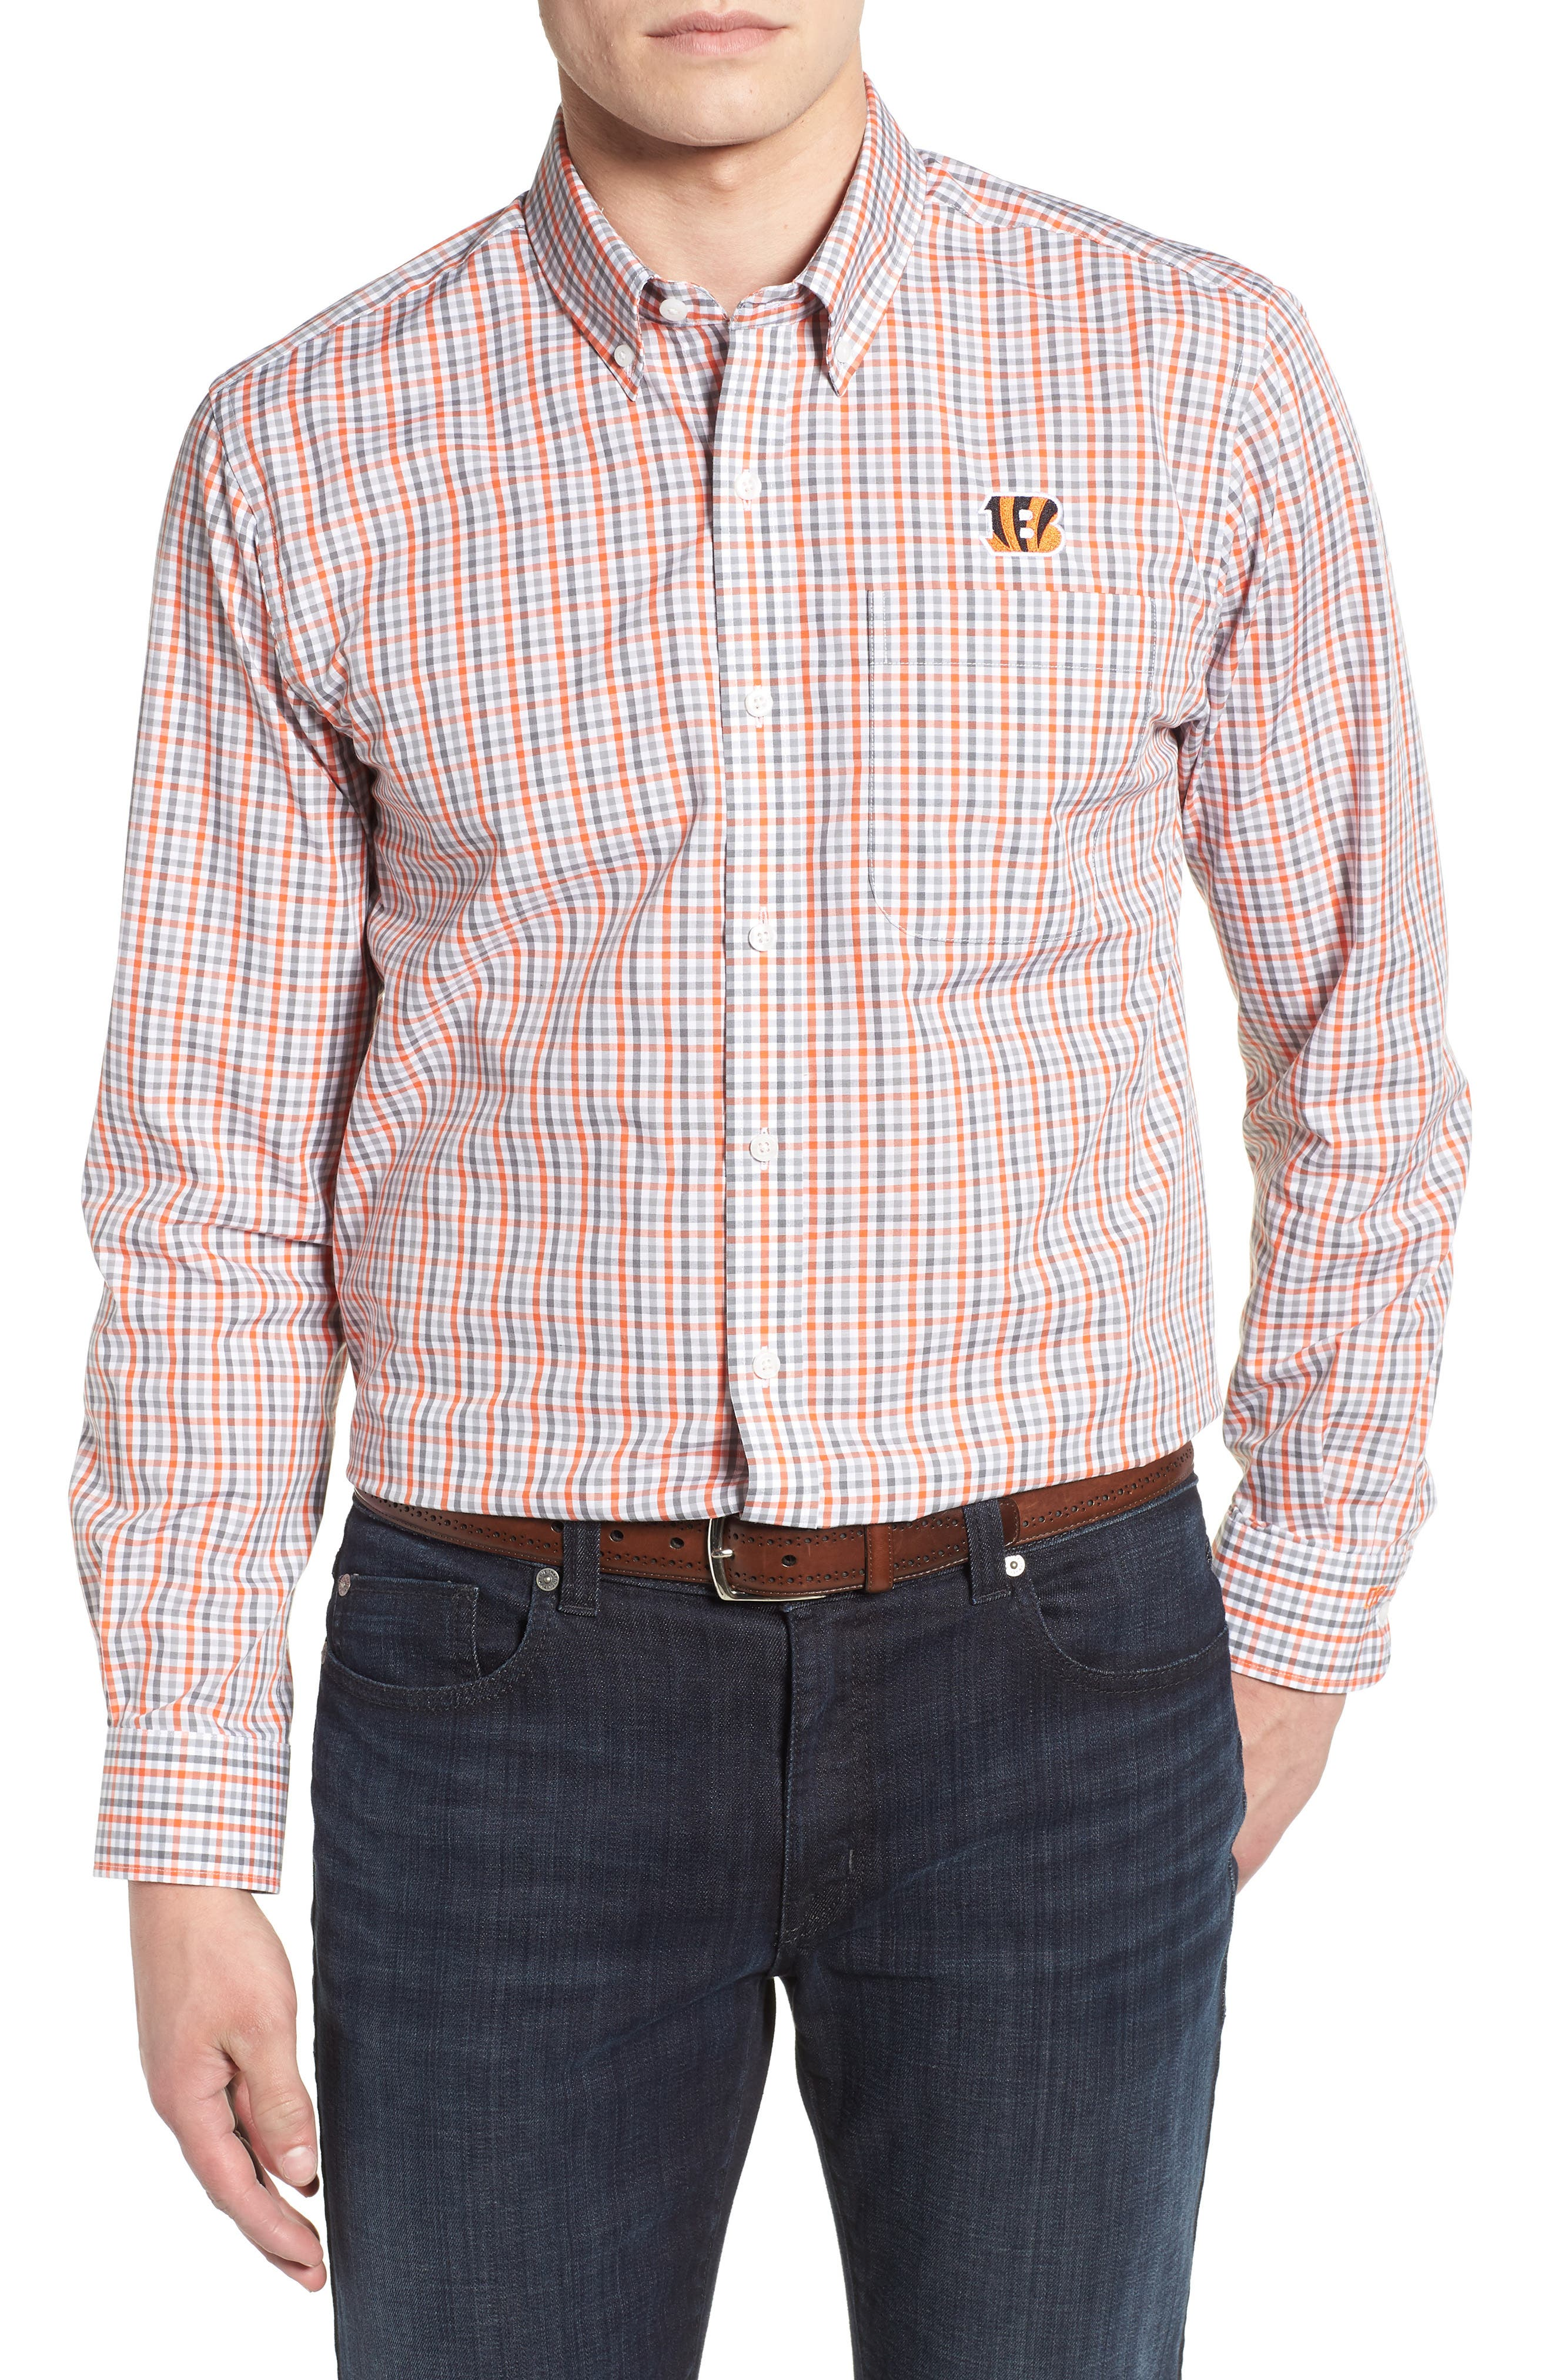 Cincinnati Bengals - Gilman Regular Fit Plaid Sport Shirt,                         Main,                         color, COLLEGE ORANGE